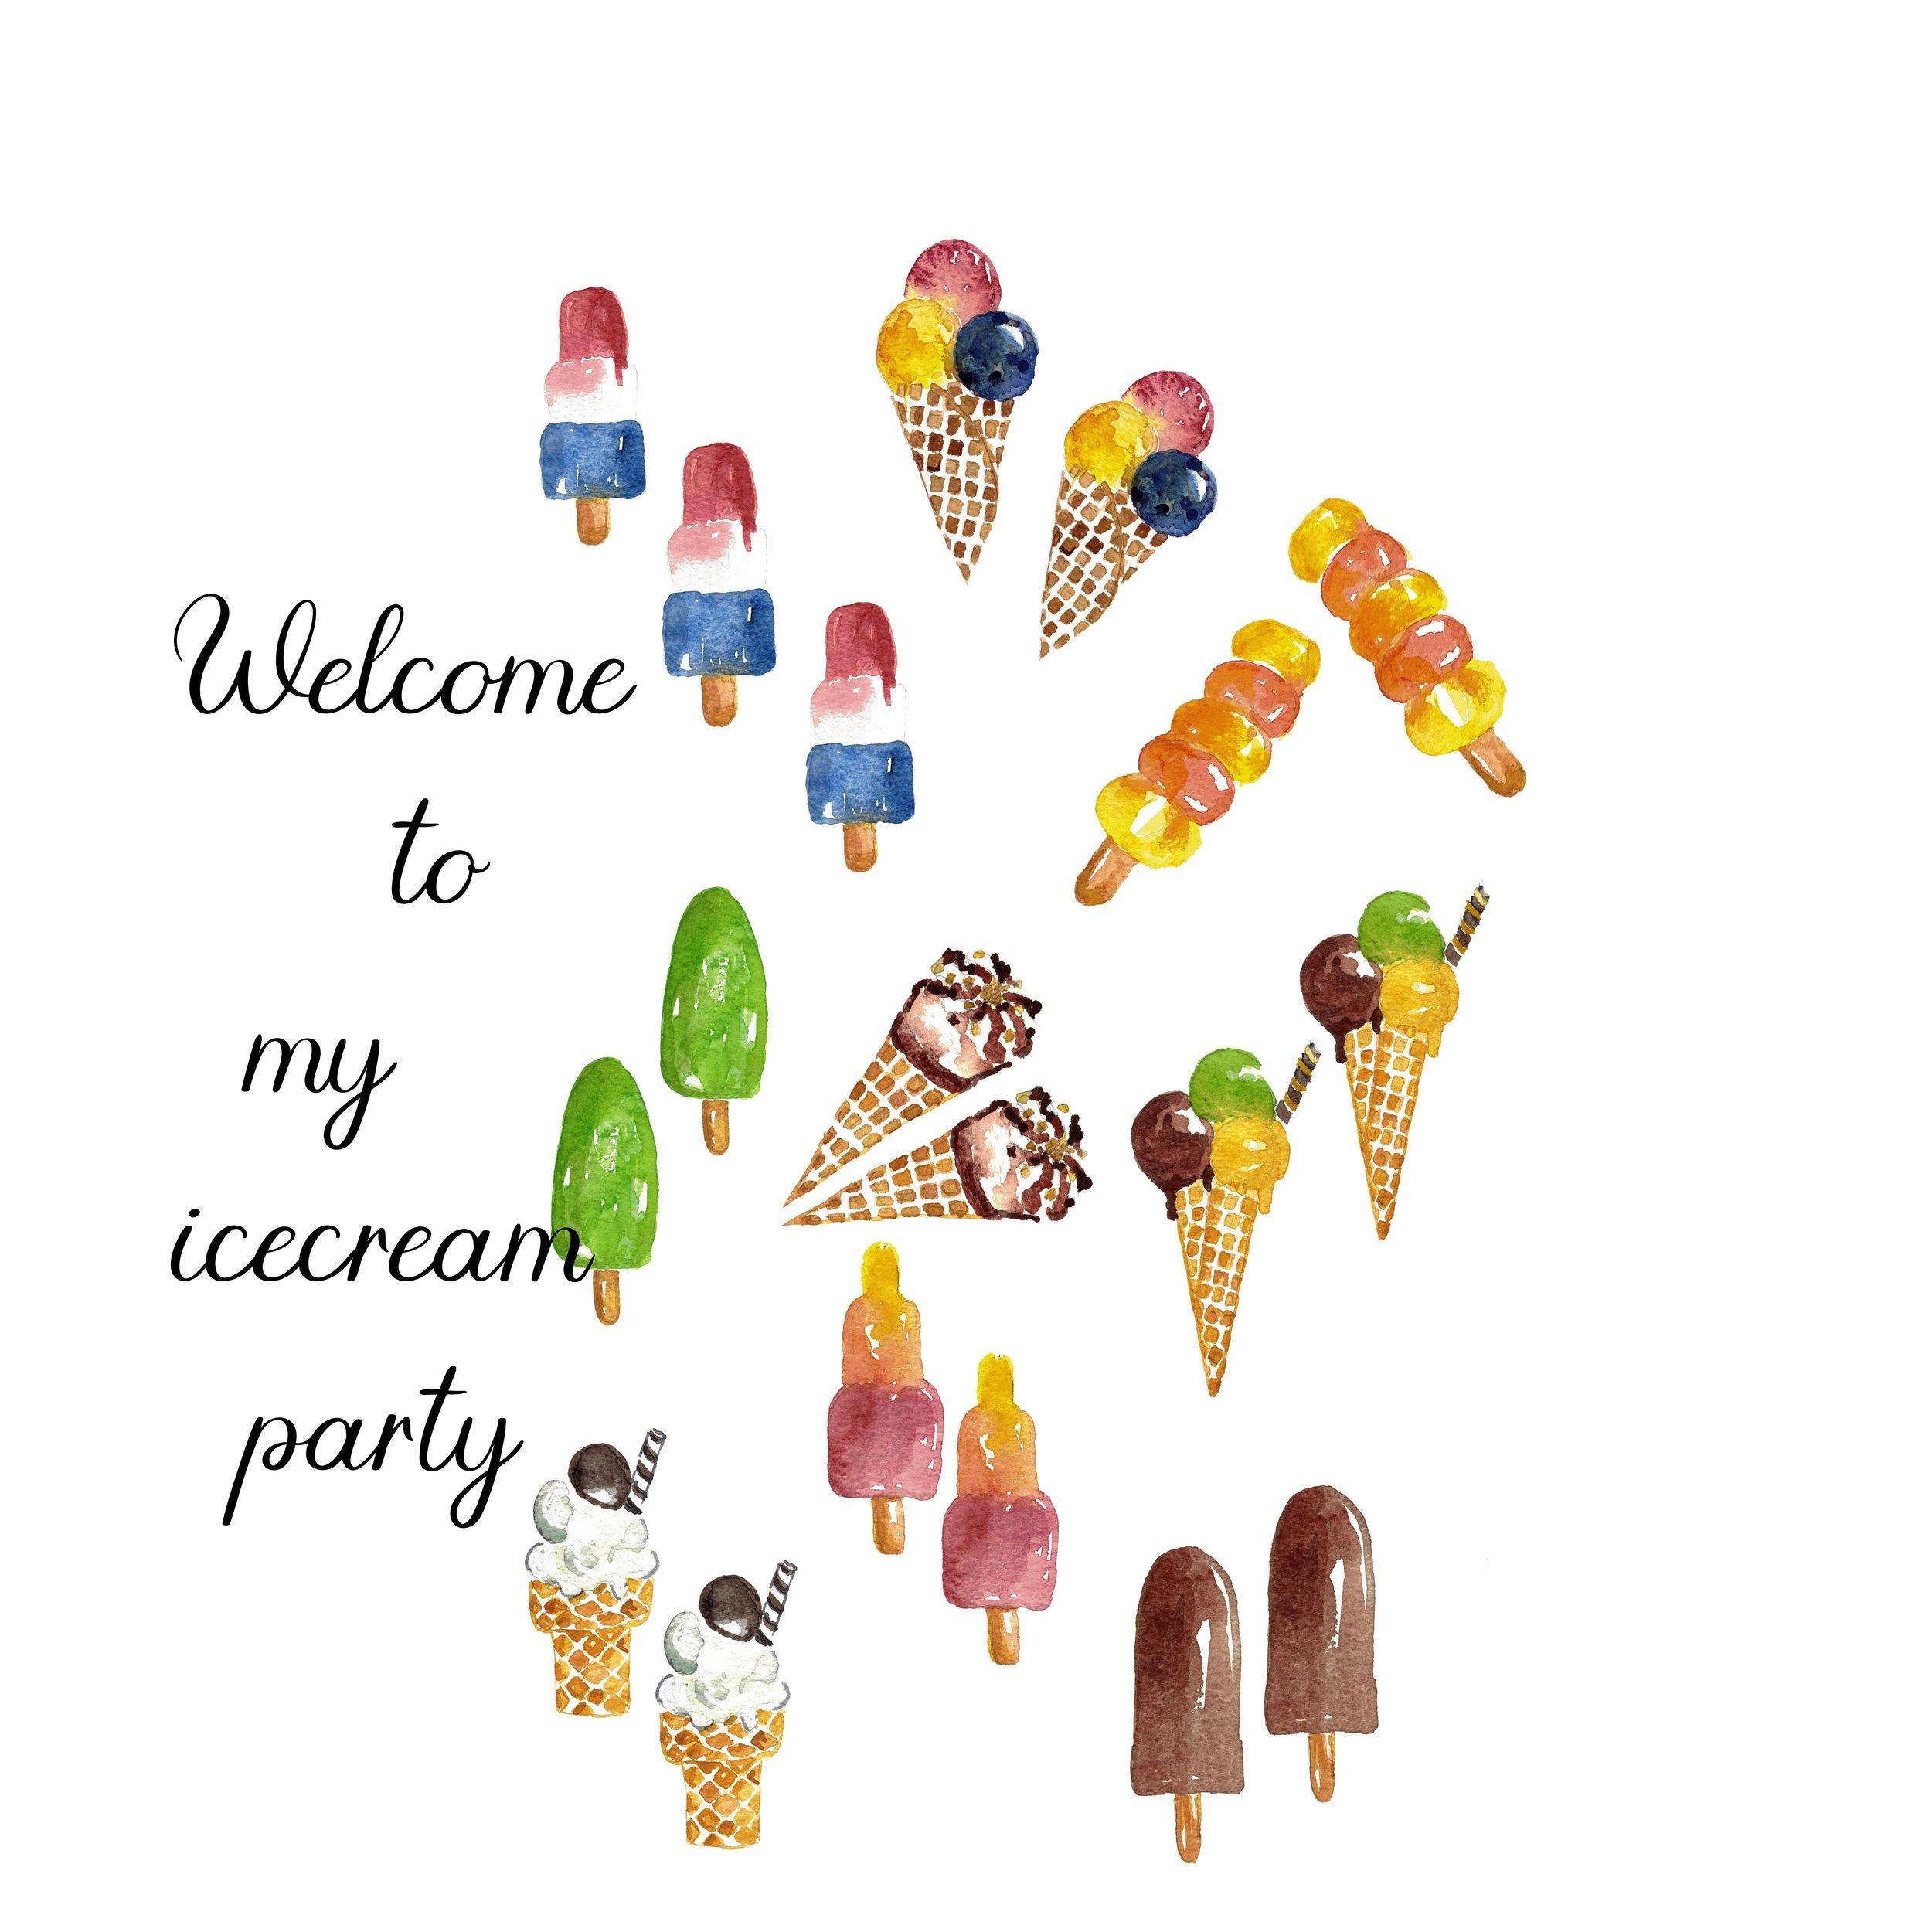 Icecream Birthday Card Template Anna Hedeklint Design Illustration